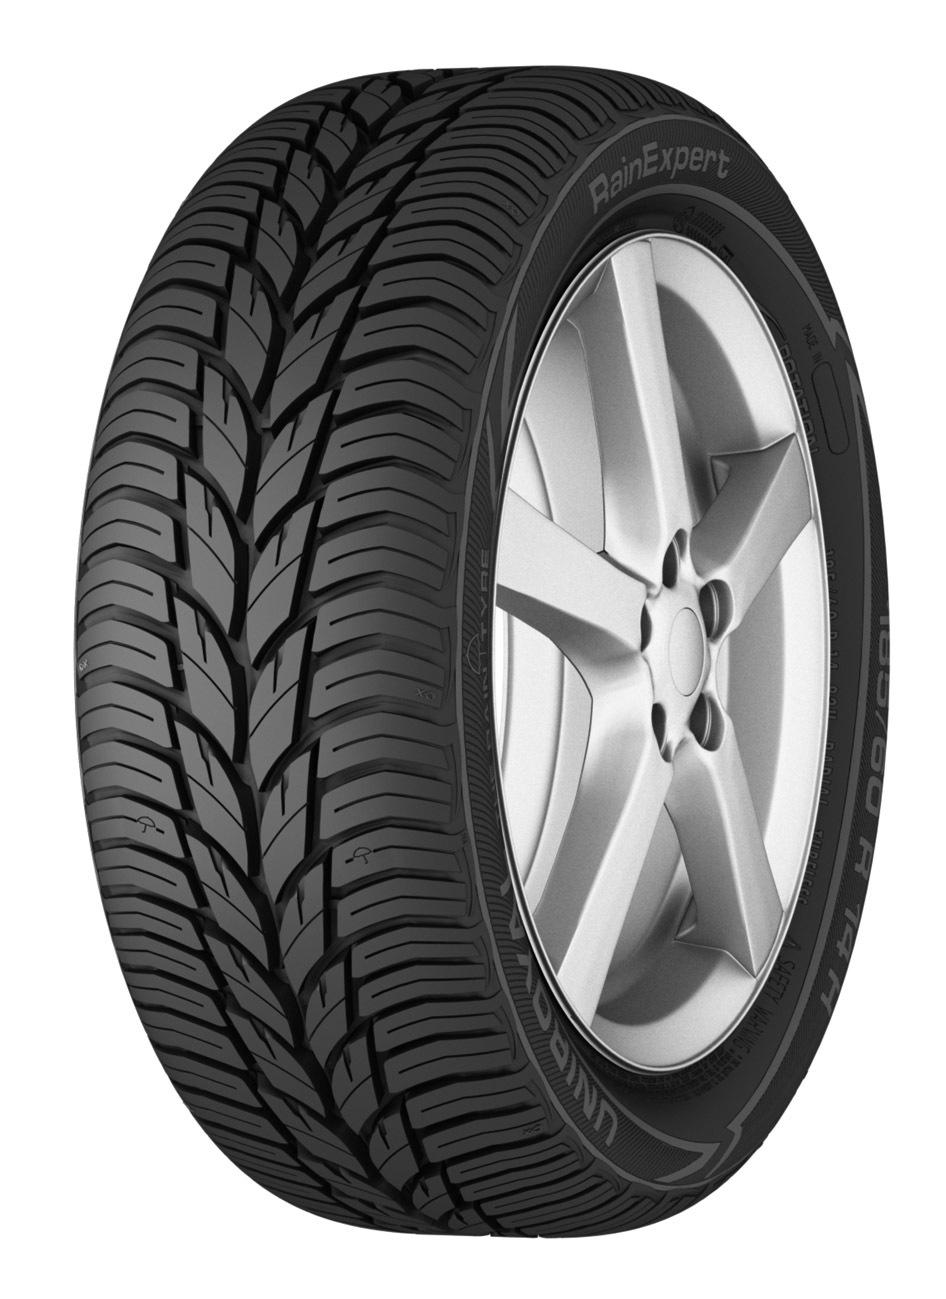 RainExpert tyre image